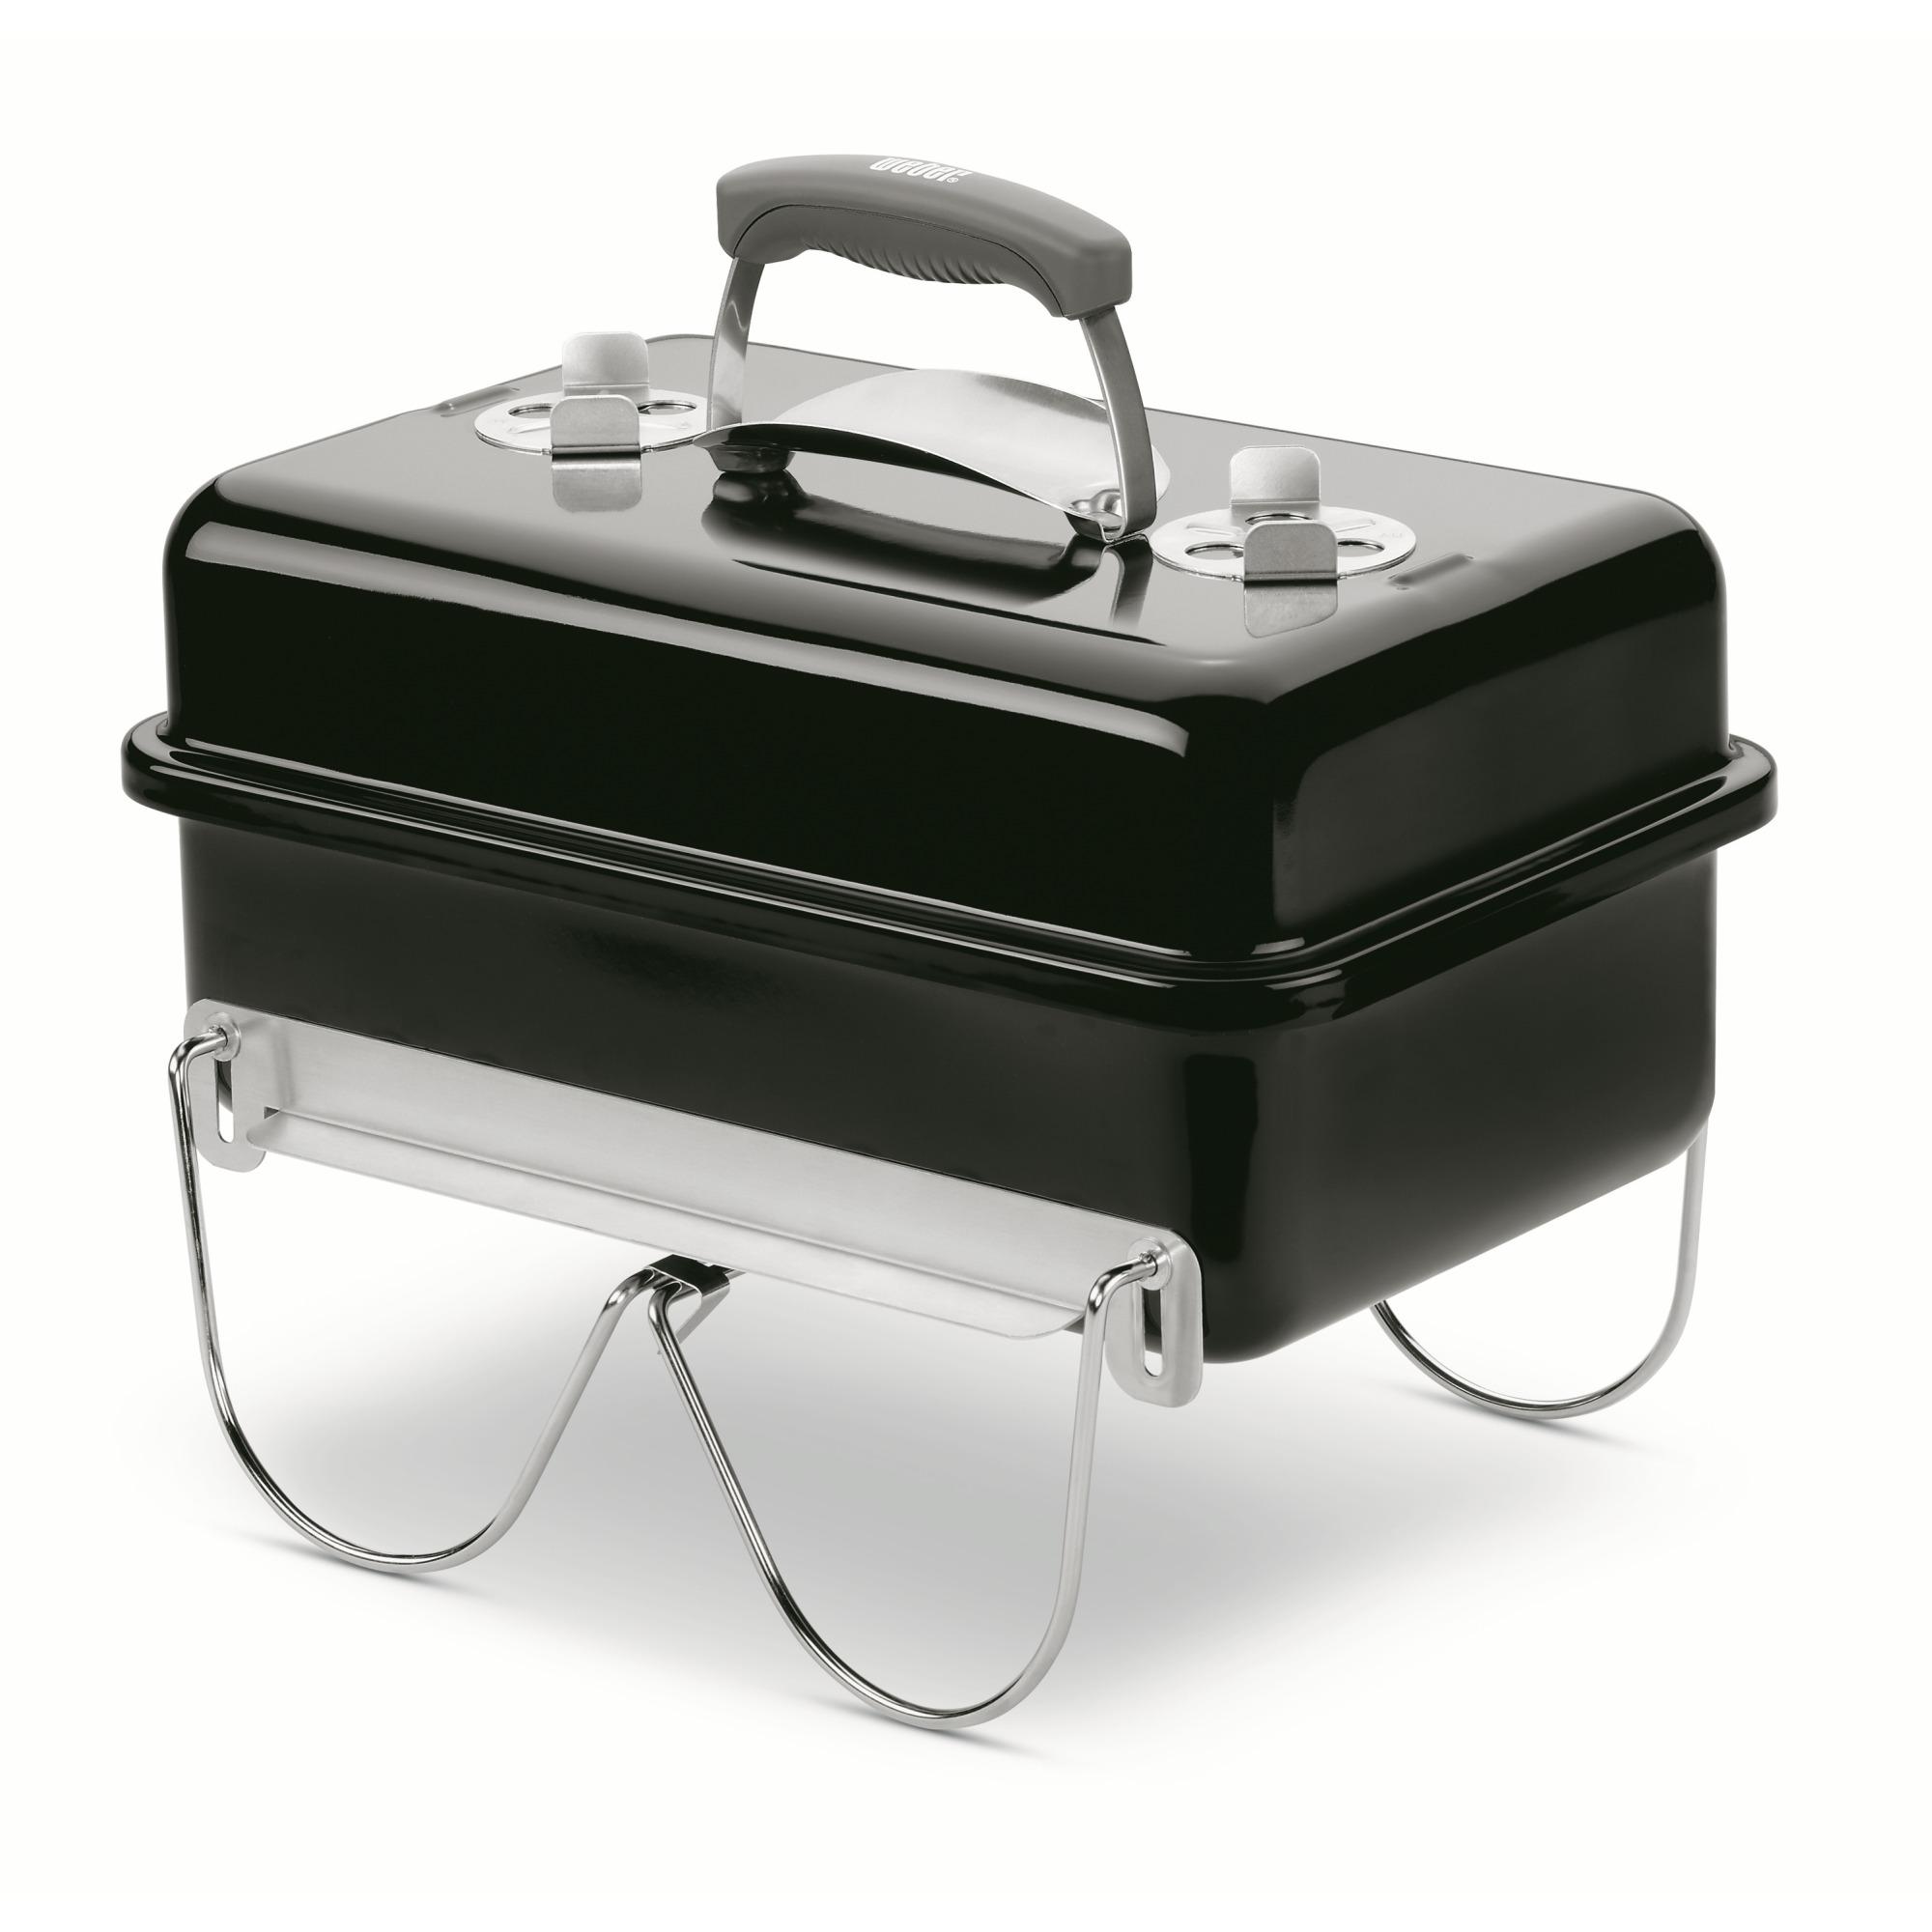 Weber Go Anywhere houtskoolbarbecue metaal zwart 53x37 cm